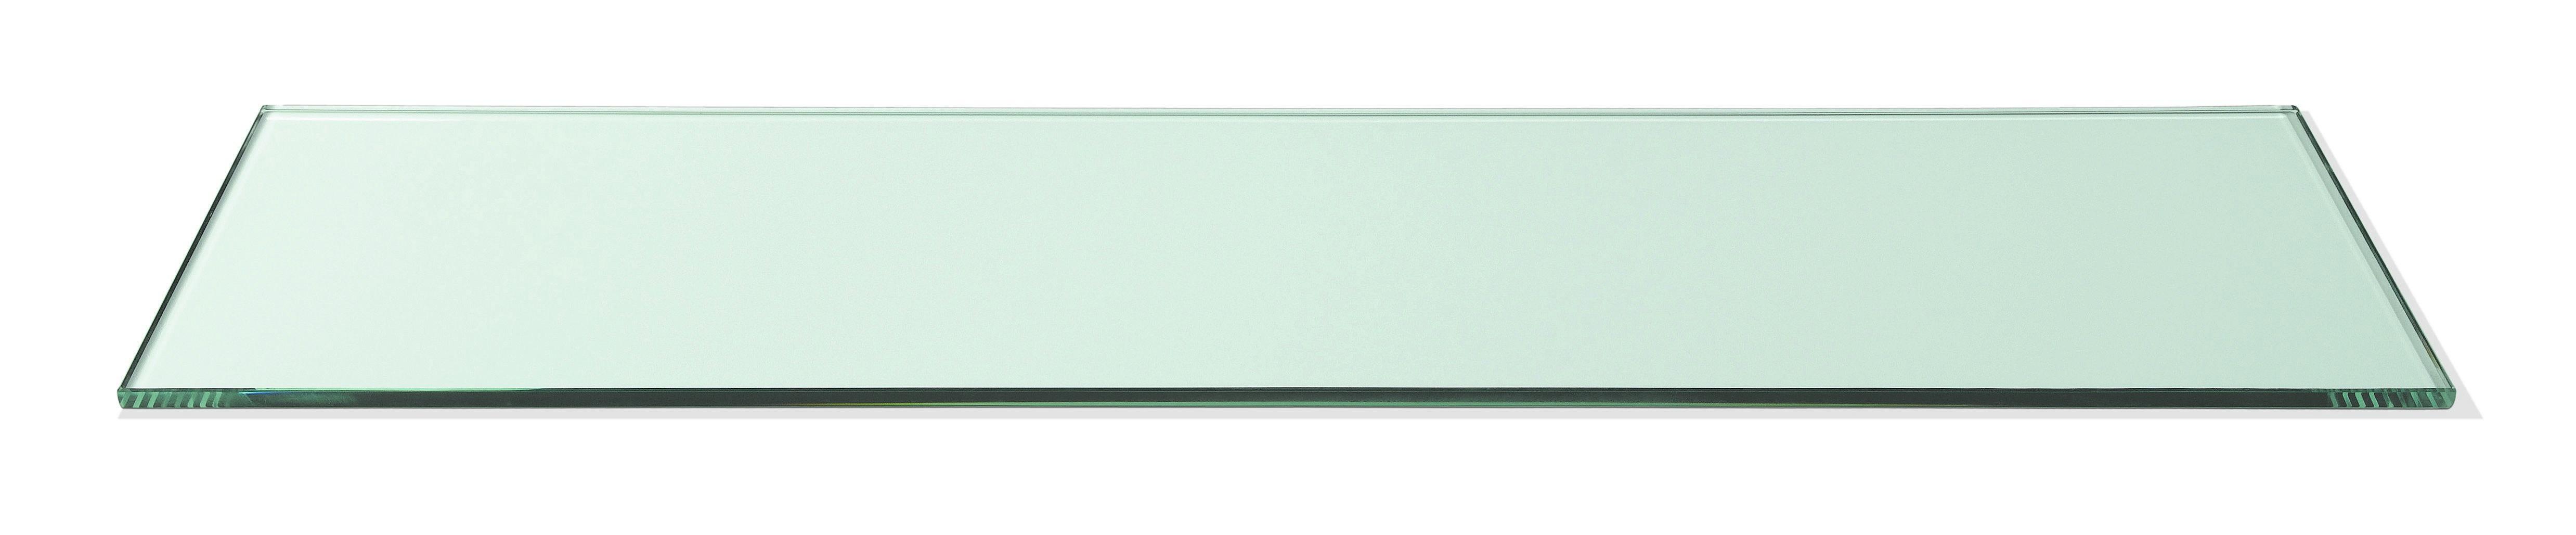 "Rosseto SG014 Narrow Rectangular Clear Acrylic Surface 33.5"" x 7.75"""